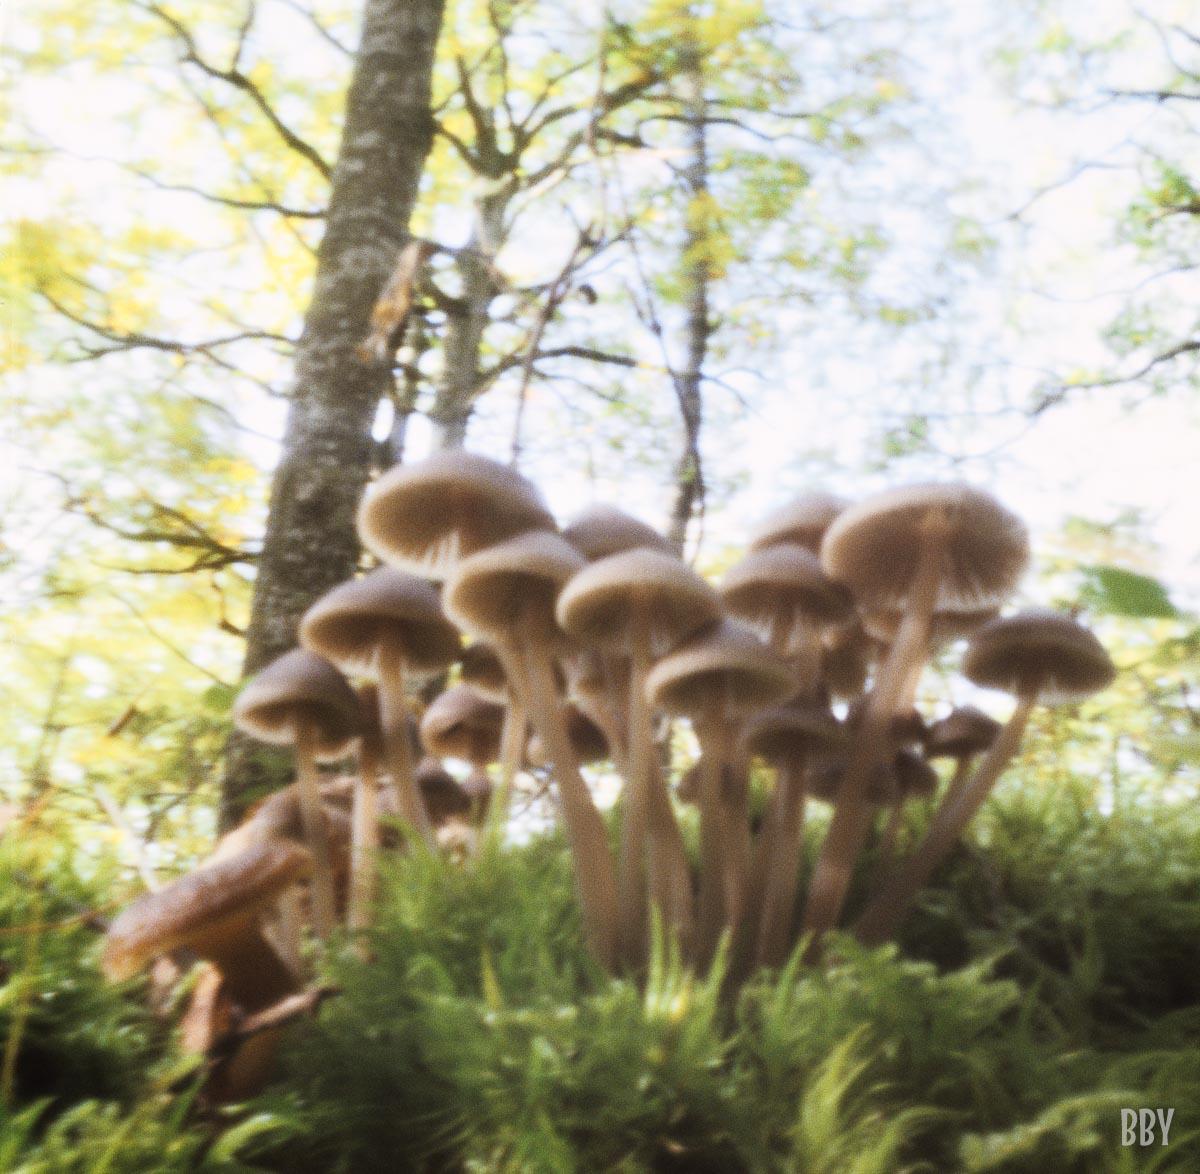 stenope, pinhole, slow photography, chambre noire, champignon, forêt, forest, mushroom